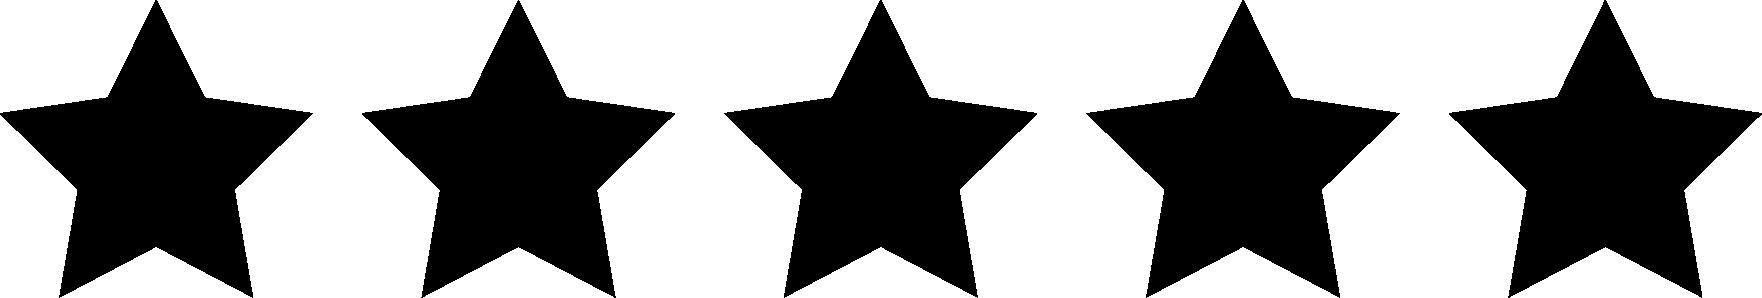 Five black stars